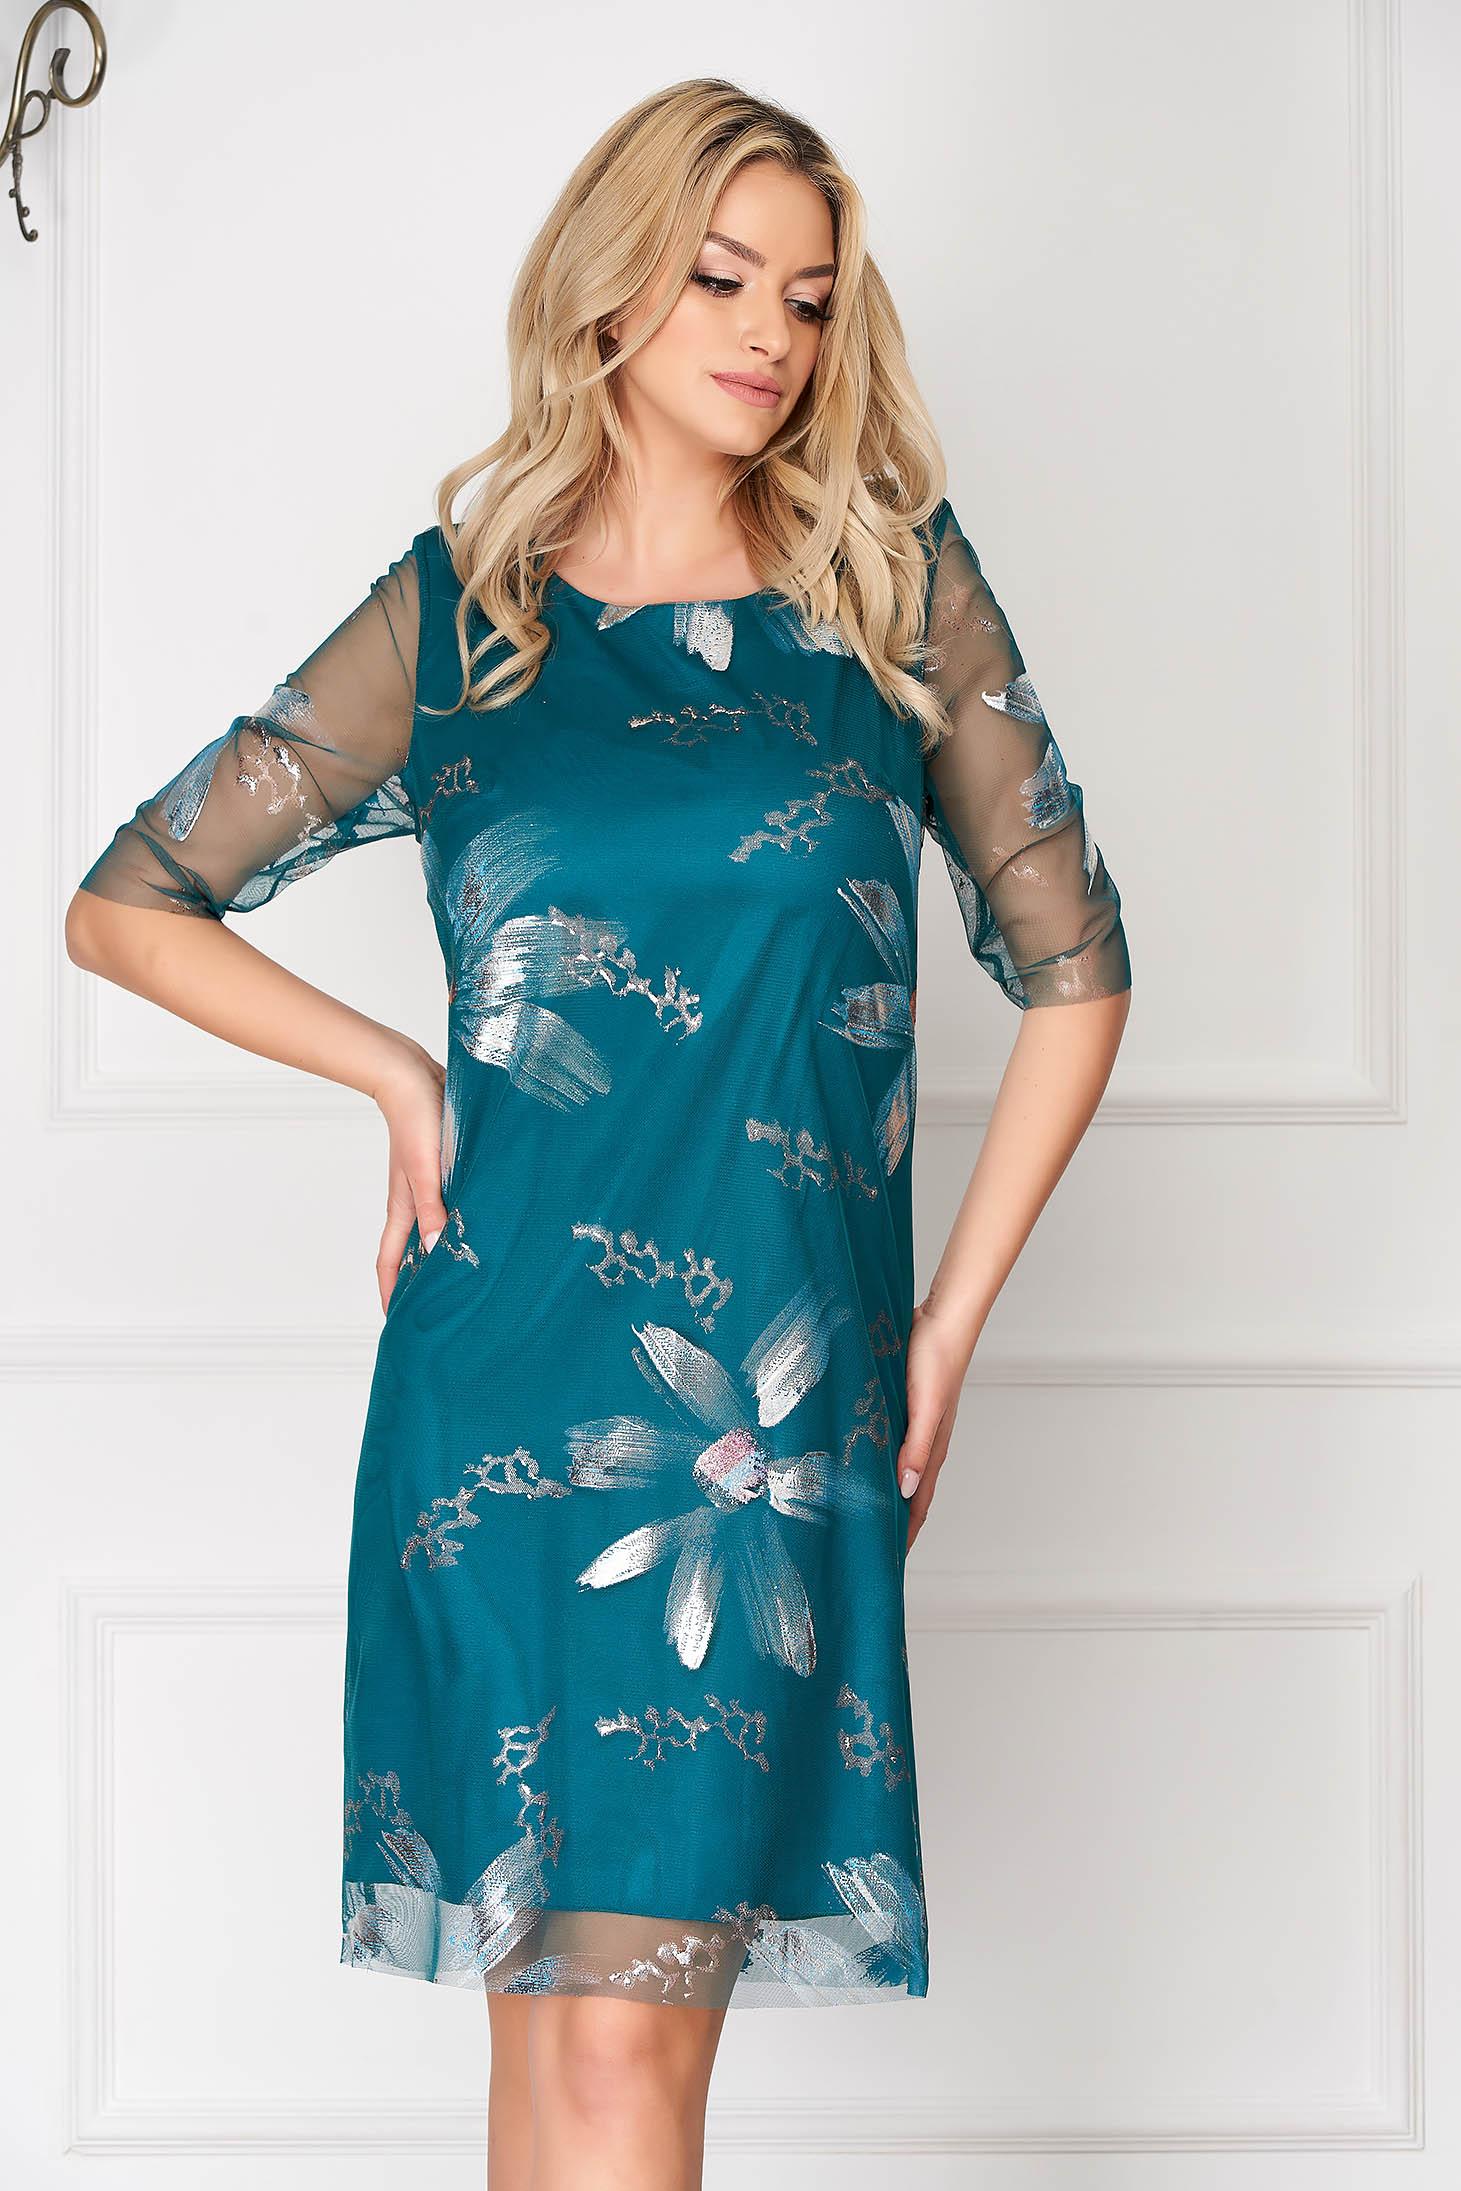 Rochie turcoaz eleganta scurta din voal cu un croi drept si imprimeuri florale